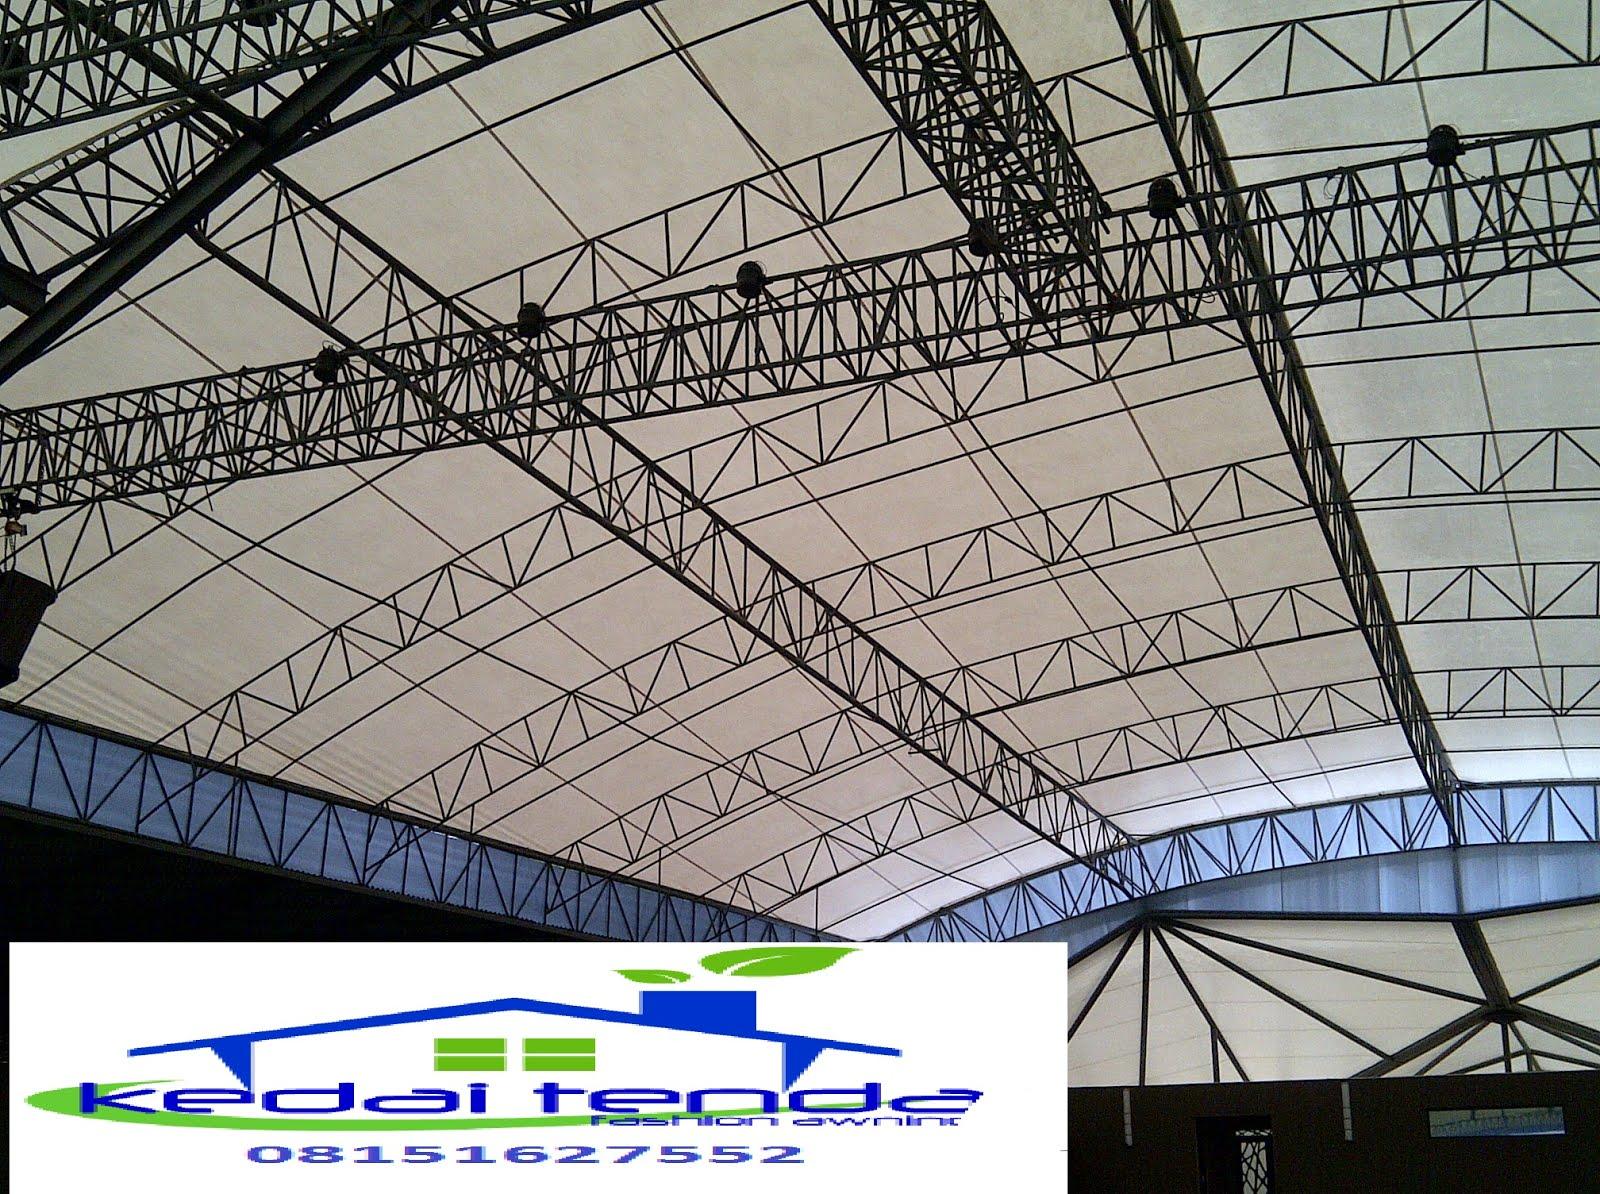 tenda membrane   08151627552 ( KARSUDI )